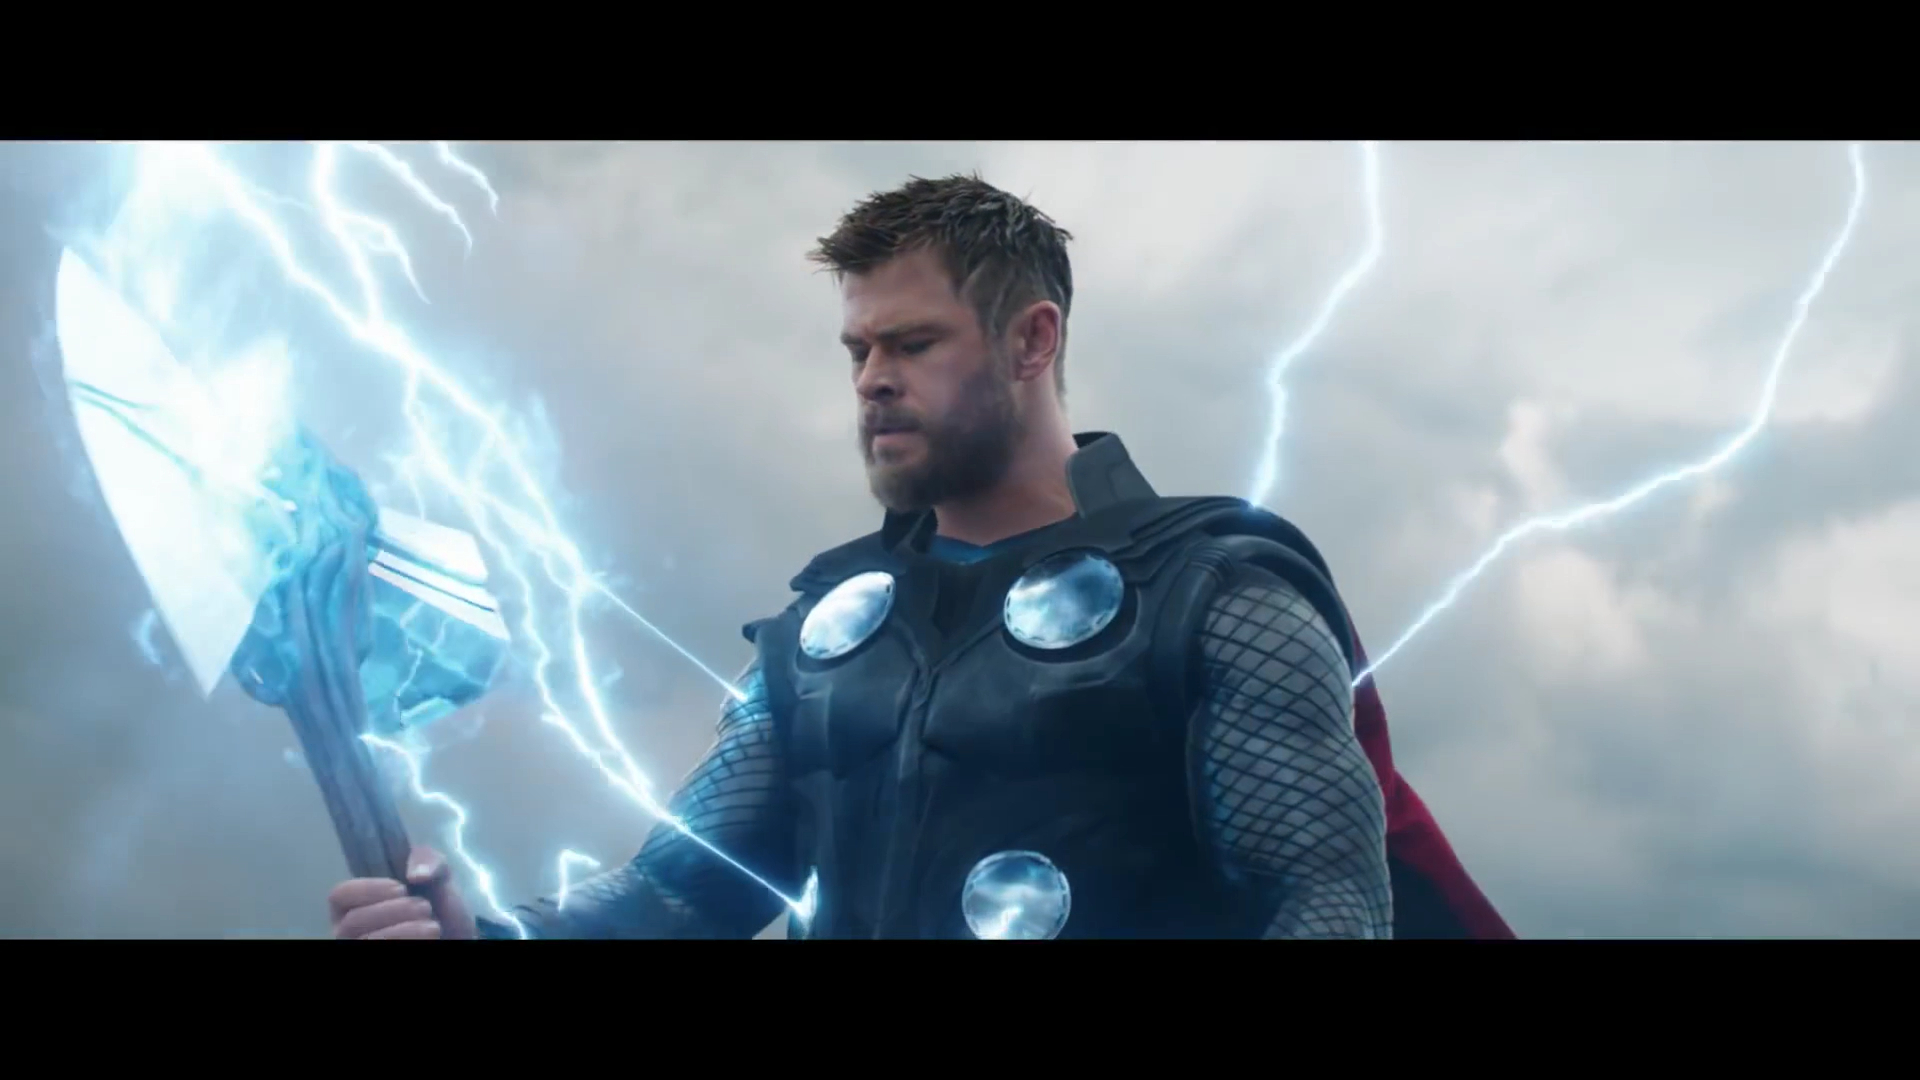 Avengers Endgame 2019 Imdb